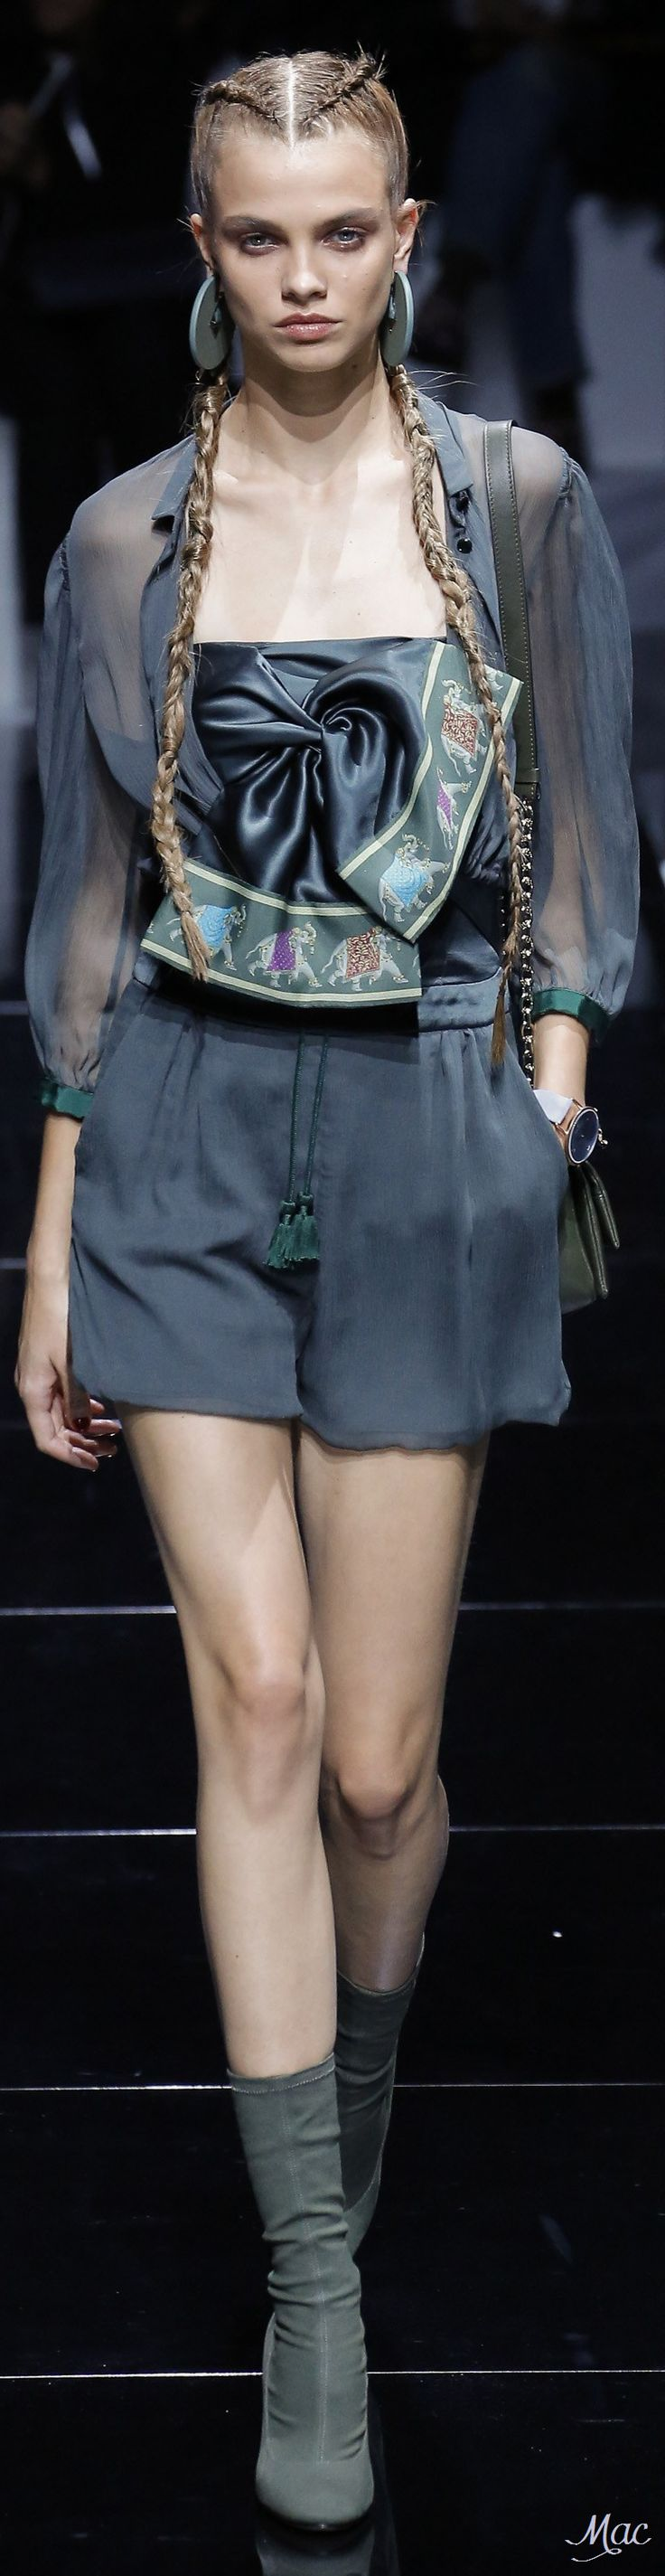 Spring 2017 Ready-to-Wear Emporio Armani